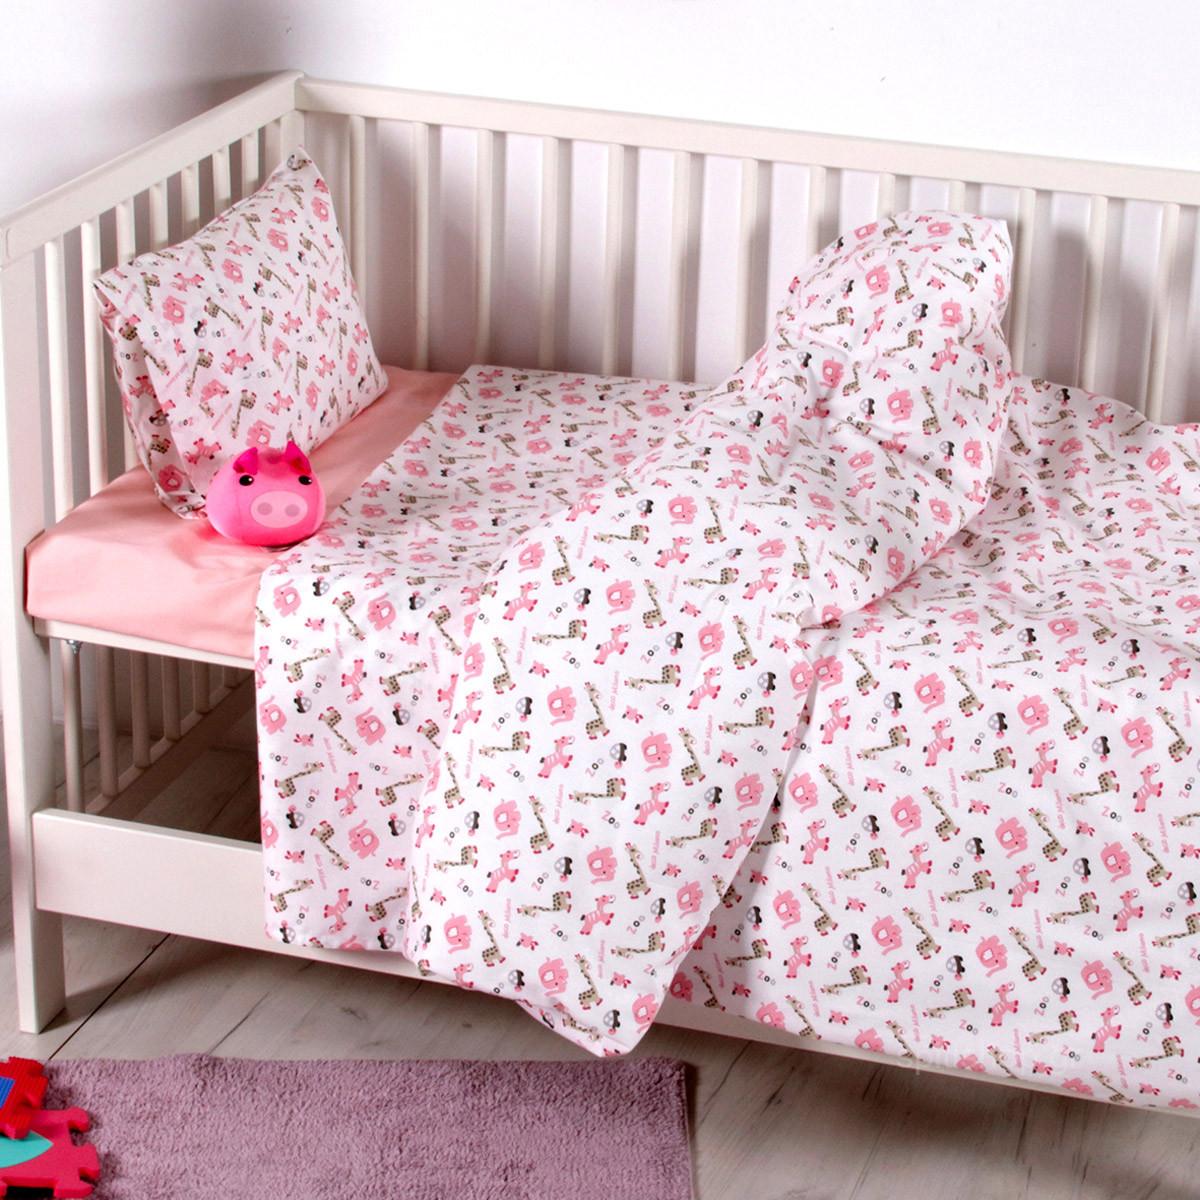 6a8a564049a Σεντόνια Κούνιας (Σετ) Sb Home Baby Melva Pink | Σπιτόκοσμος SRCosmos